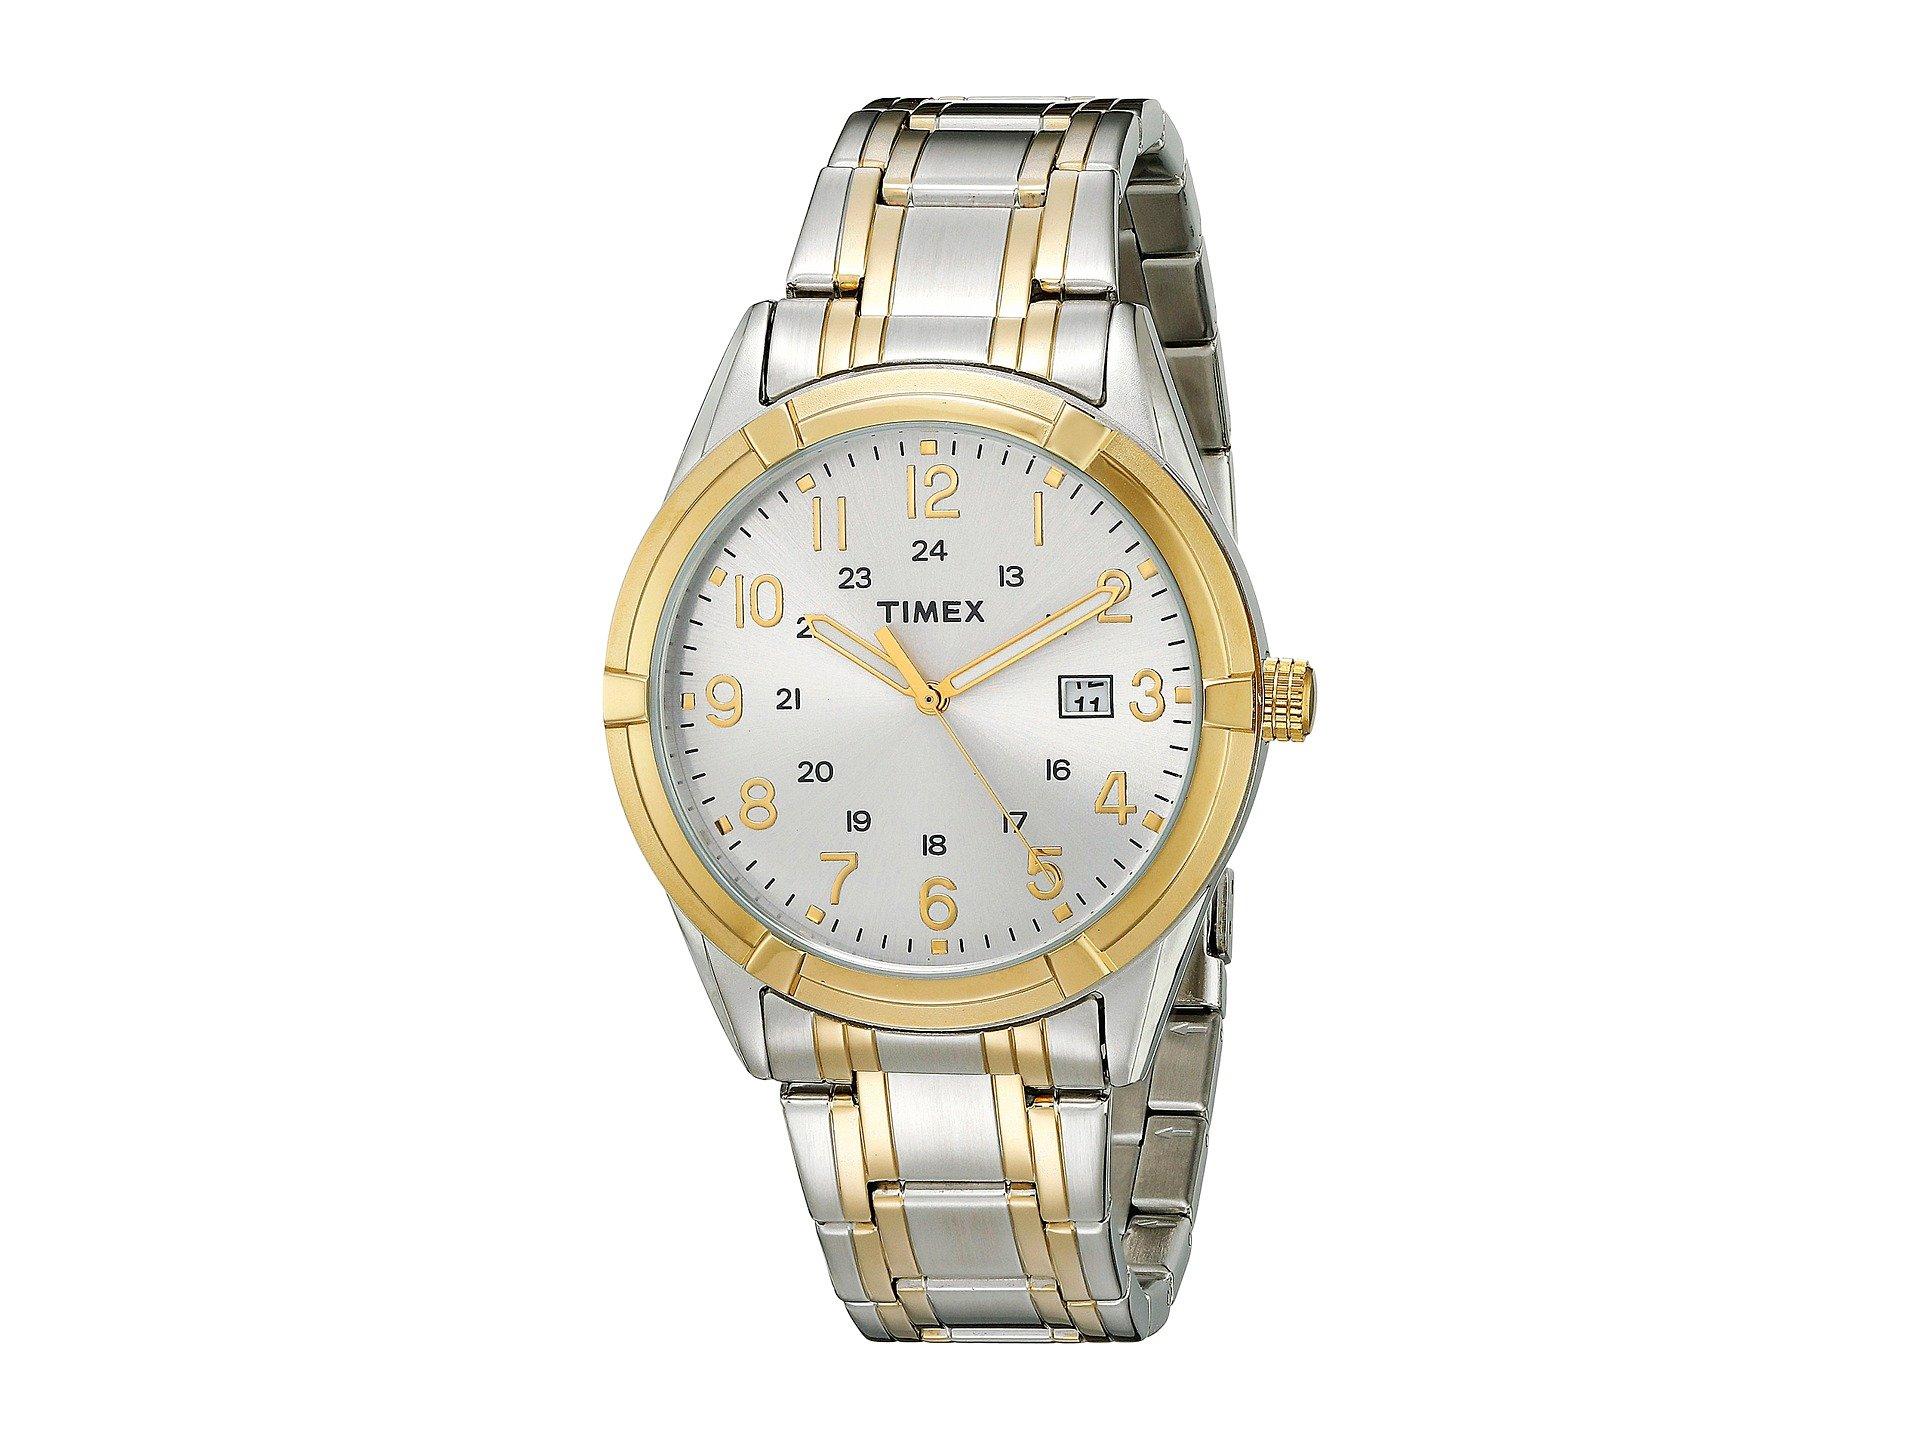 Reloj para Mujer Timex Easton Avenue 39mm Bracelet  + Timex en VeoyCompro.net